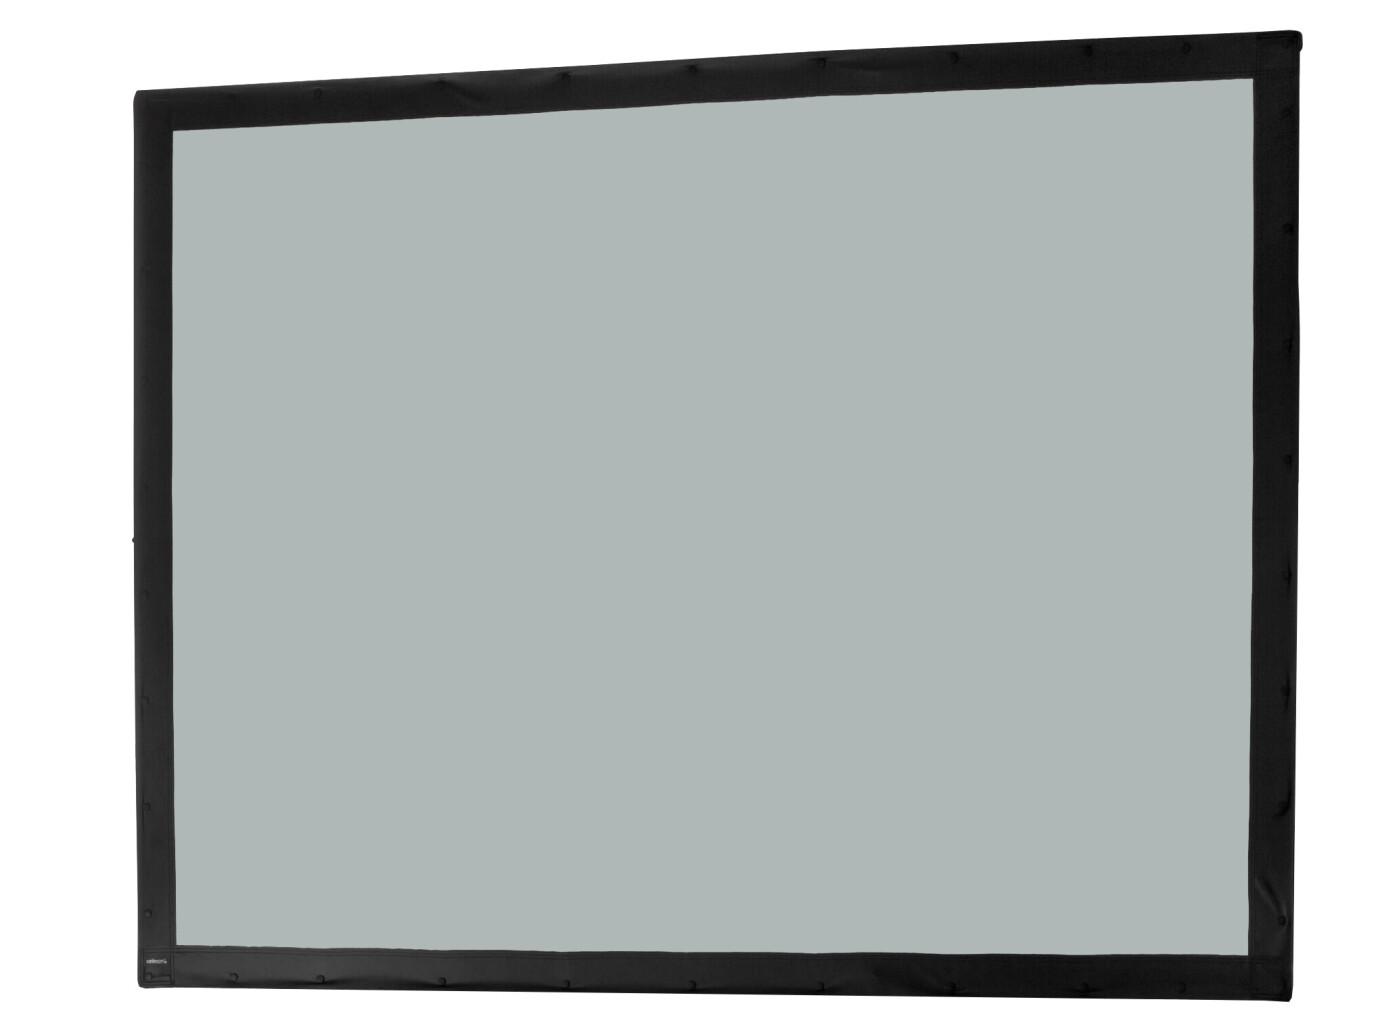 celexon Tuch für Faltrahmen Mobil Expert - 244 x 183 cm Rückprojektion